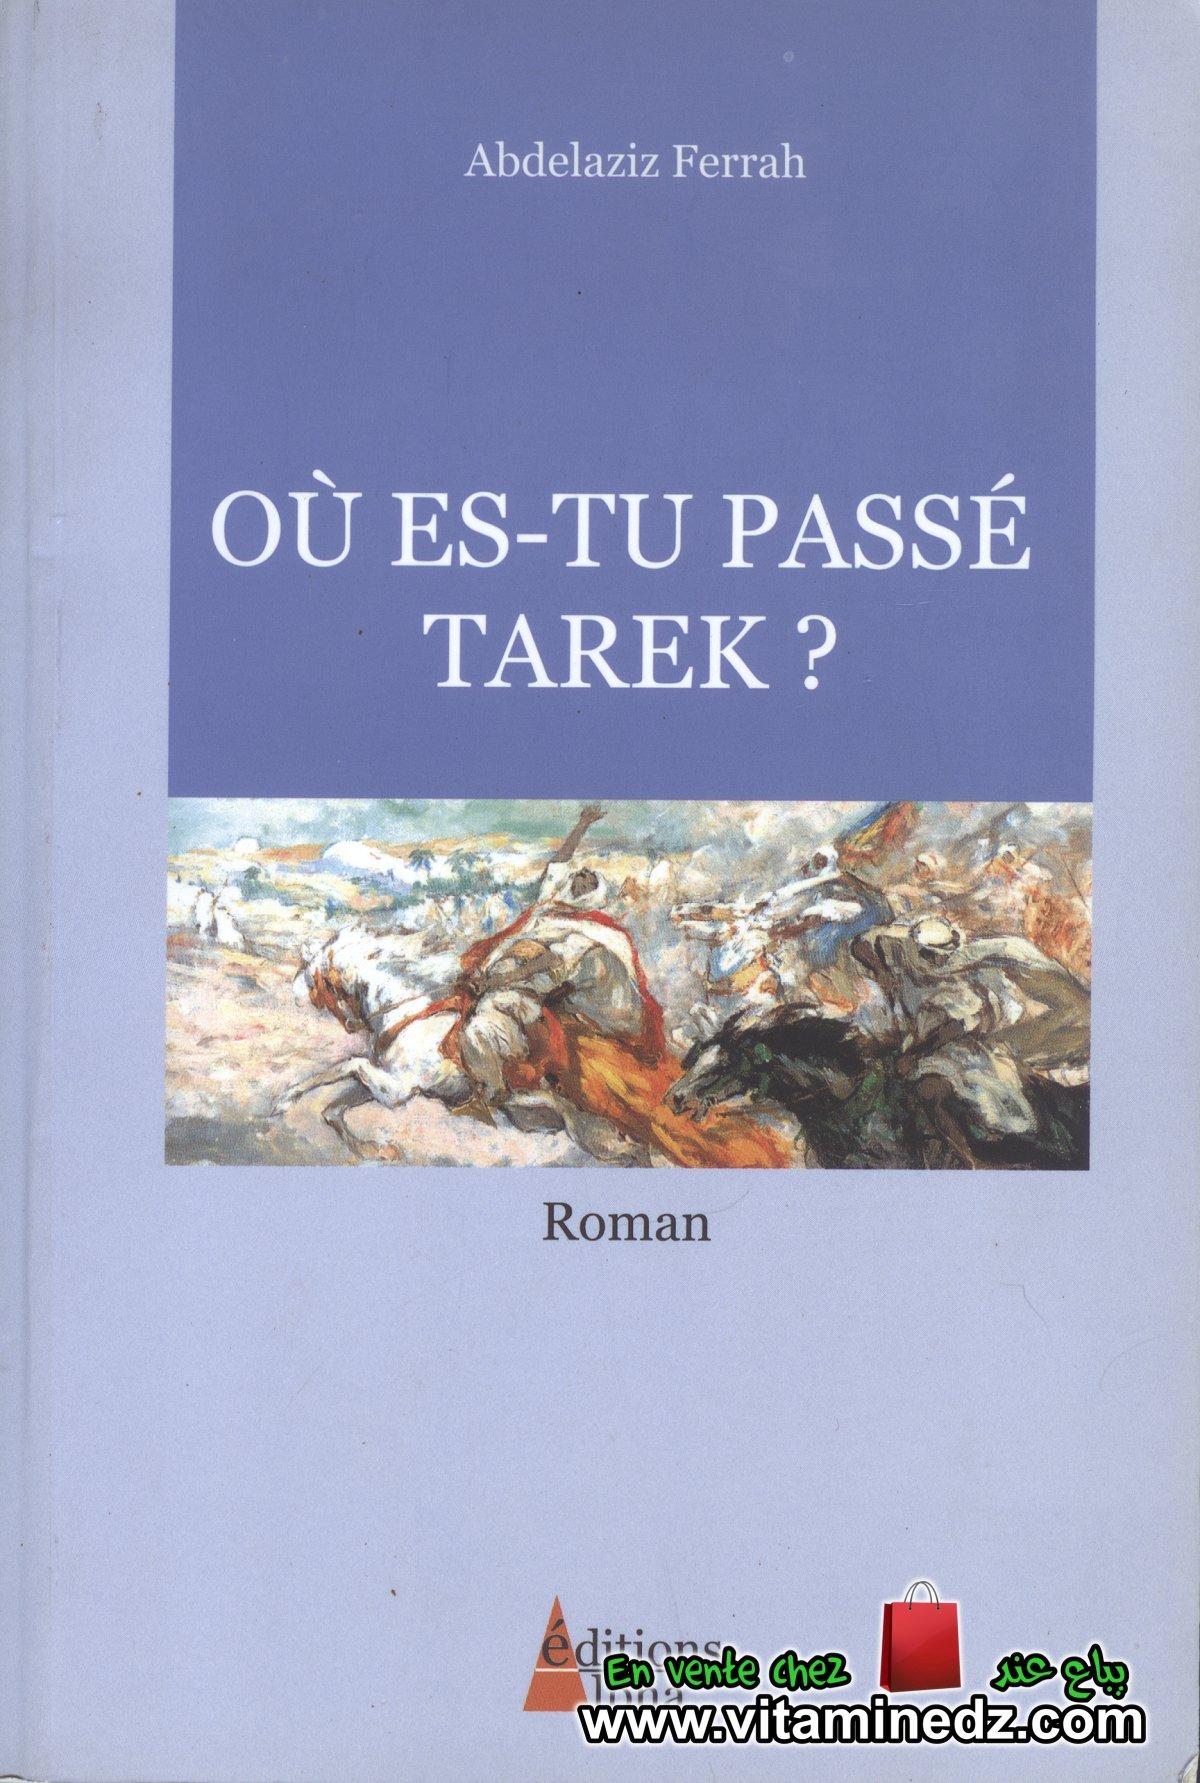 Abdel Azziz Ferrah - Où es-tu passé Tarek?